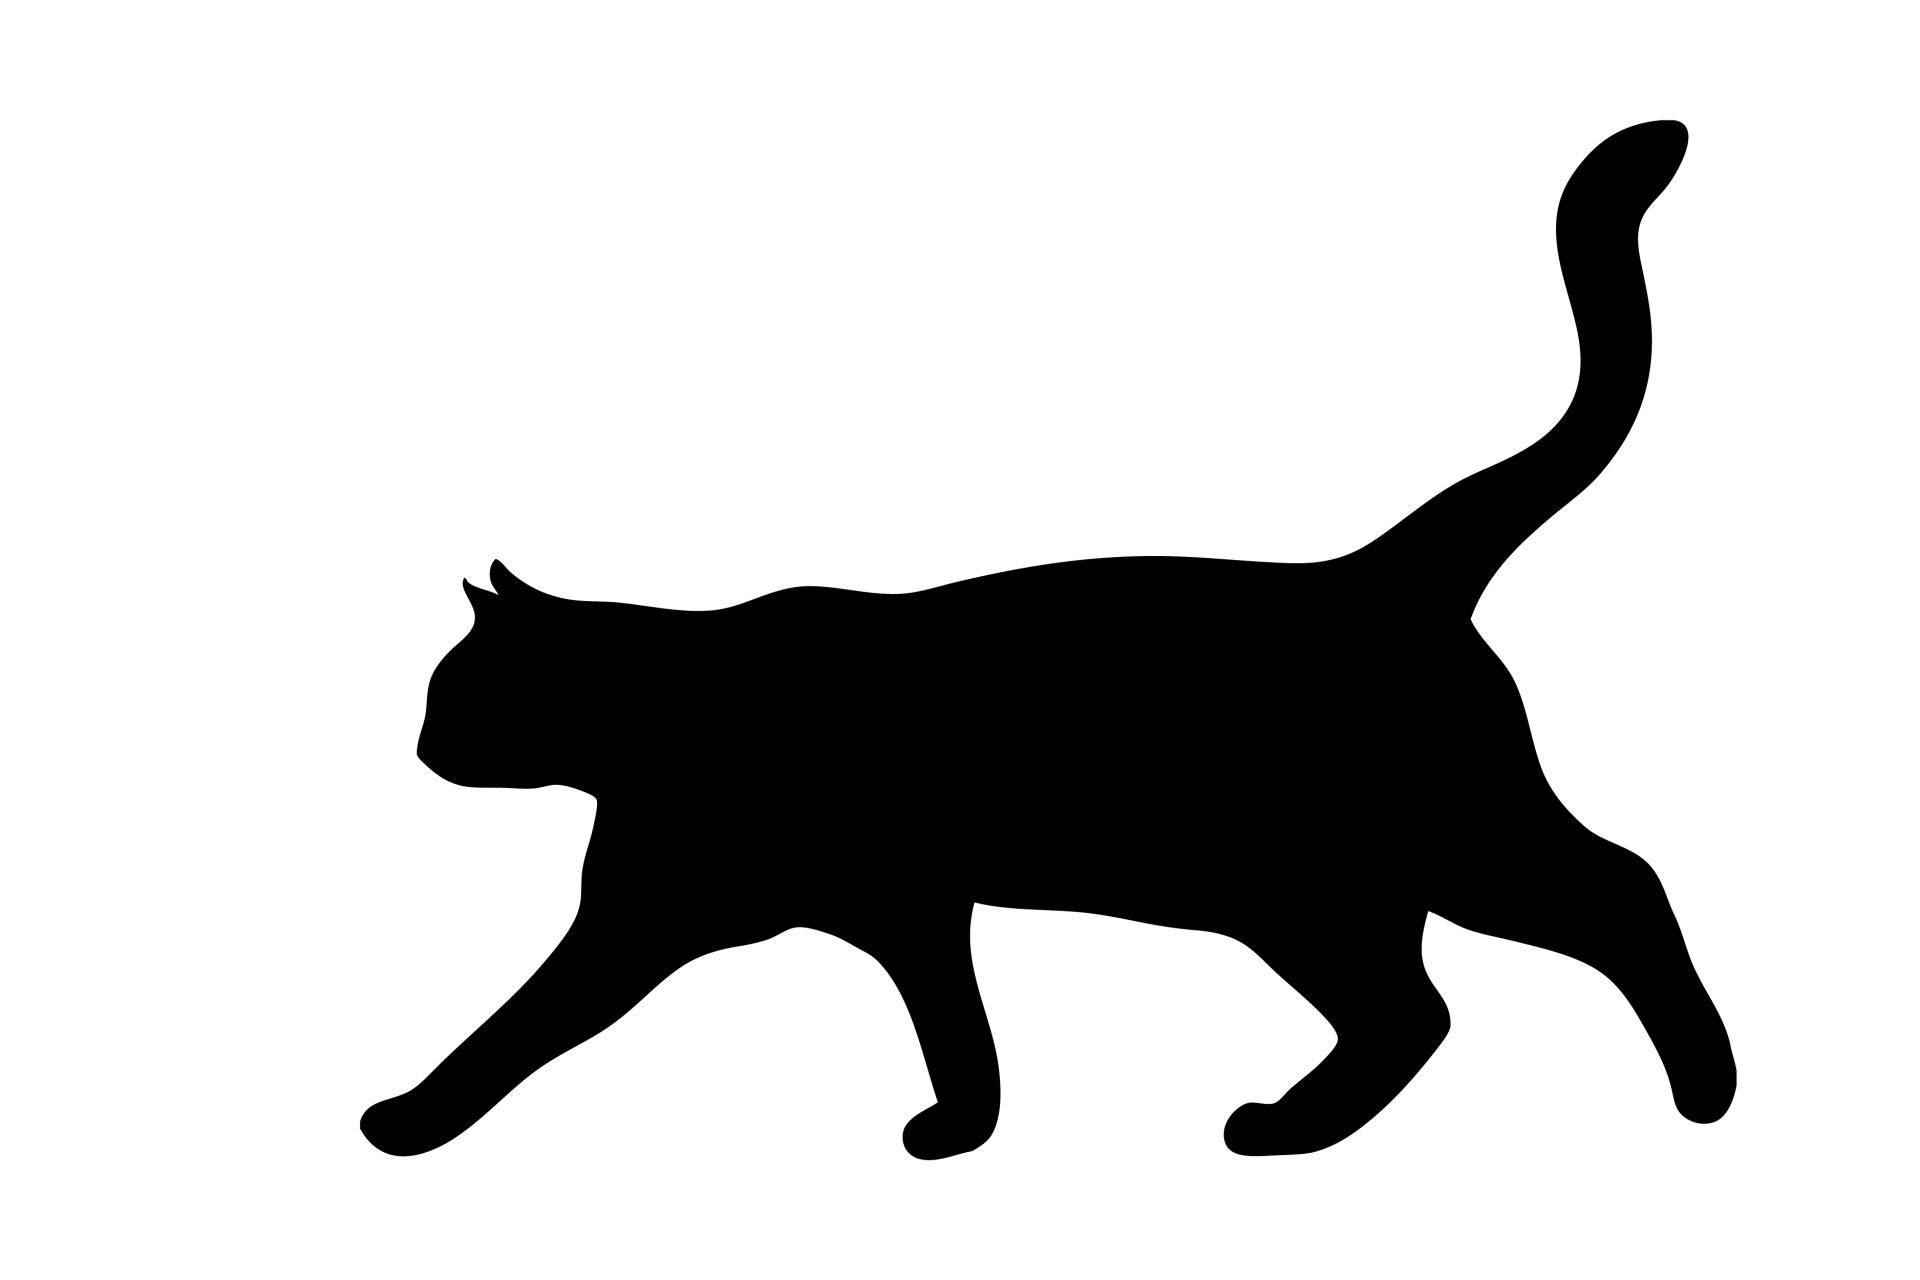 Cat Walking Black Silhouette Free Stock Photo Public